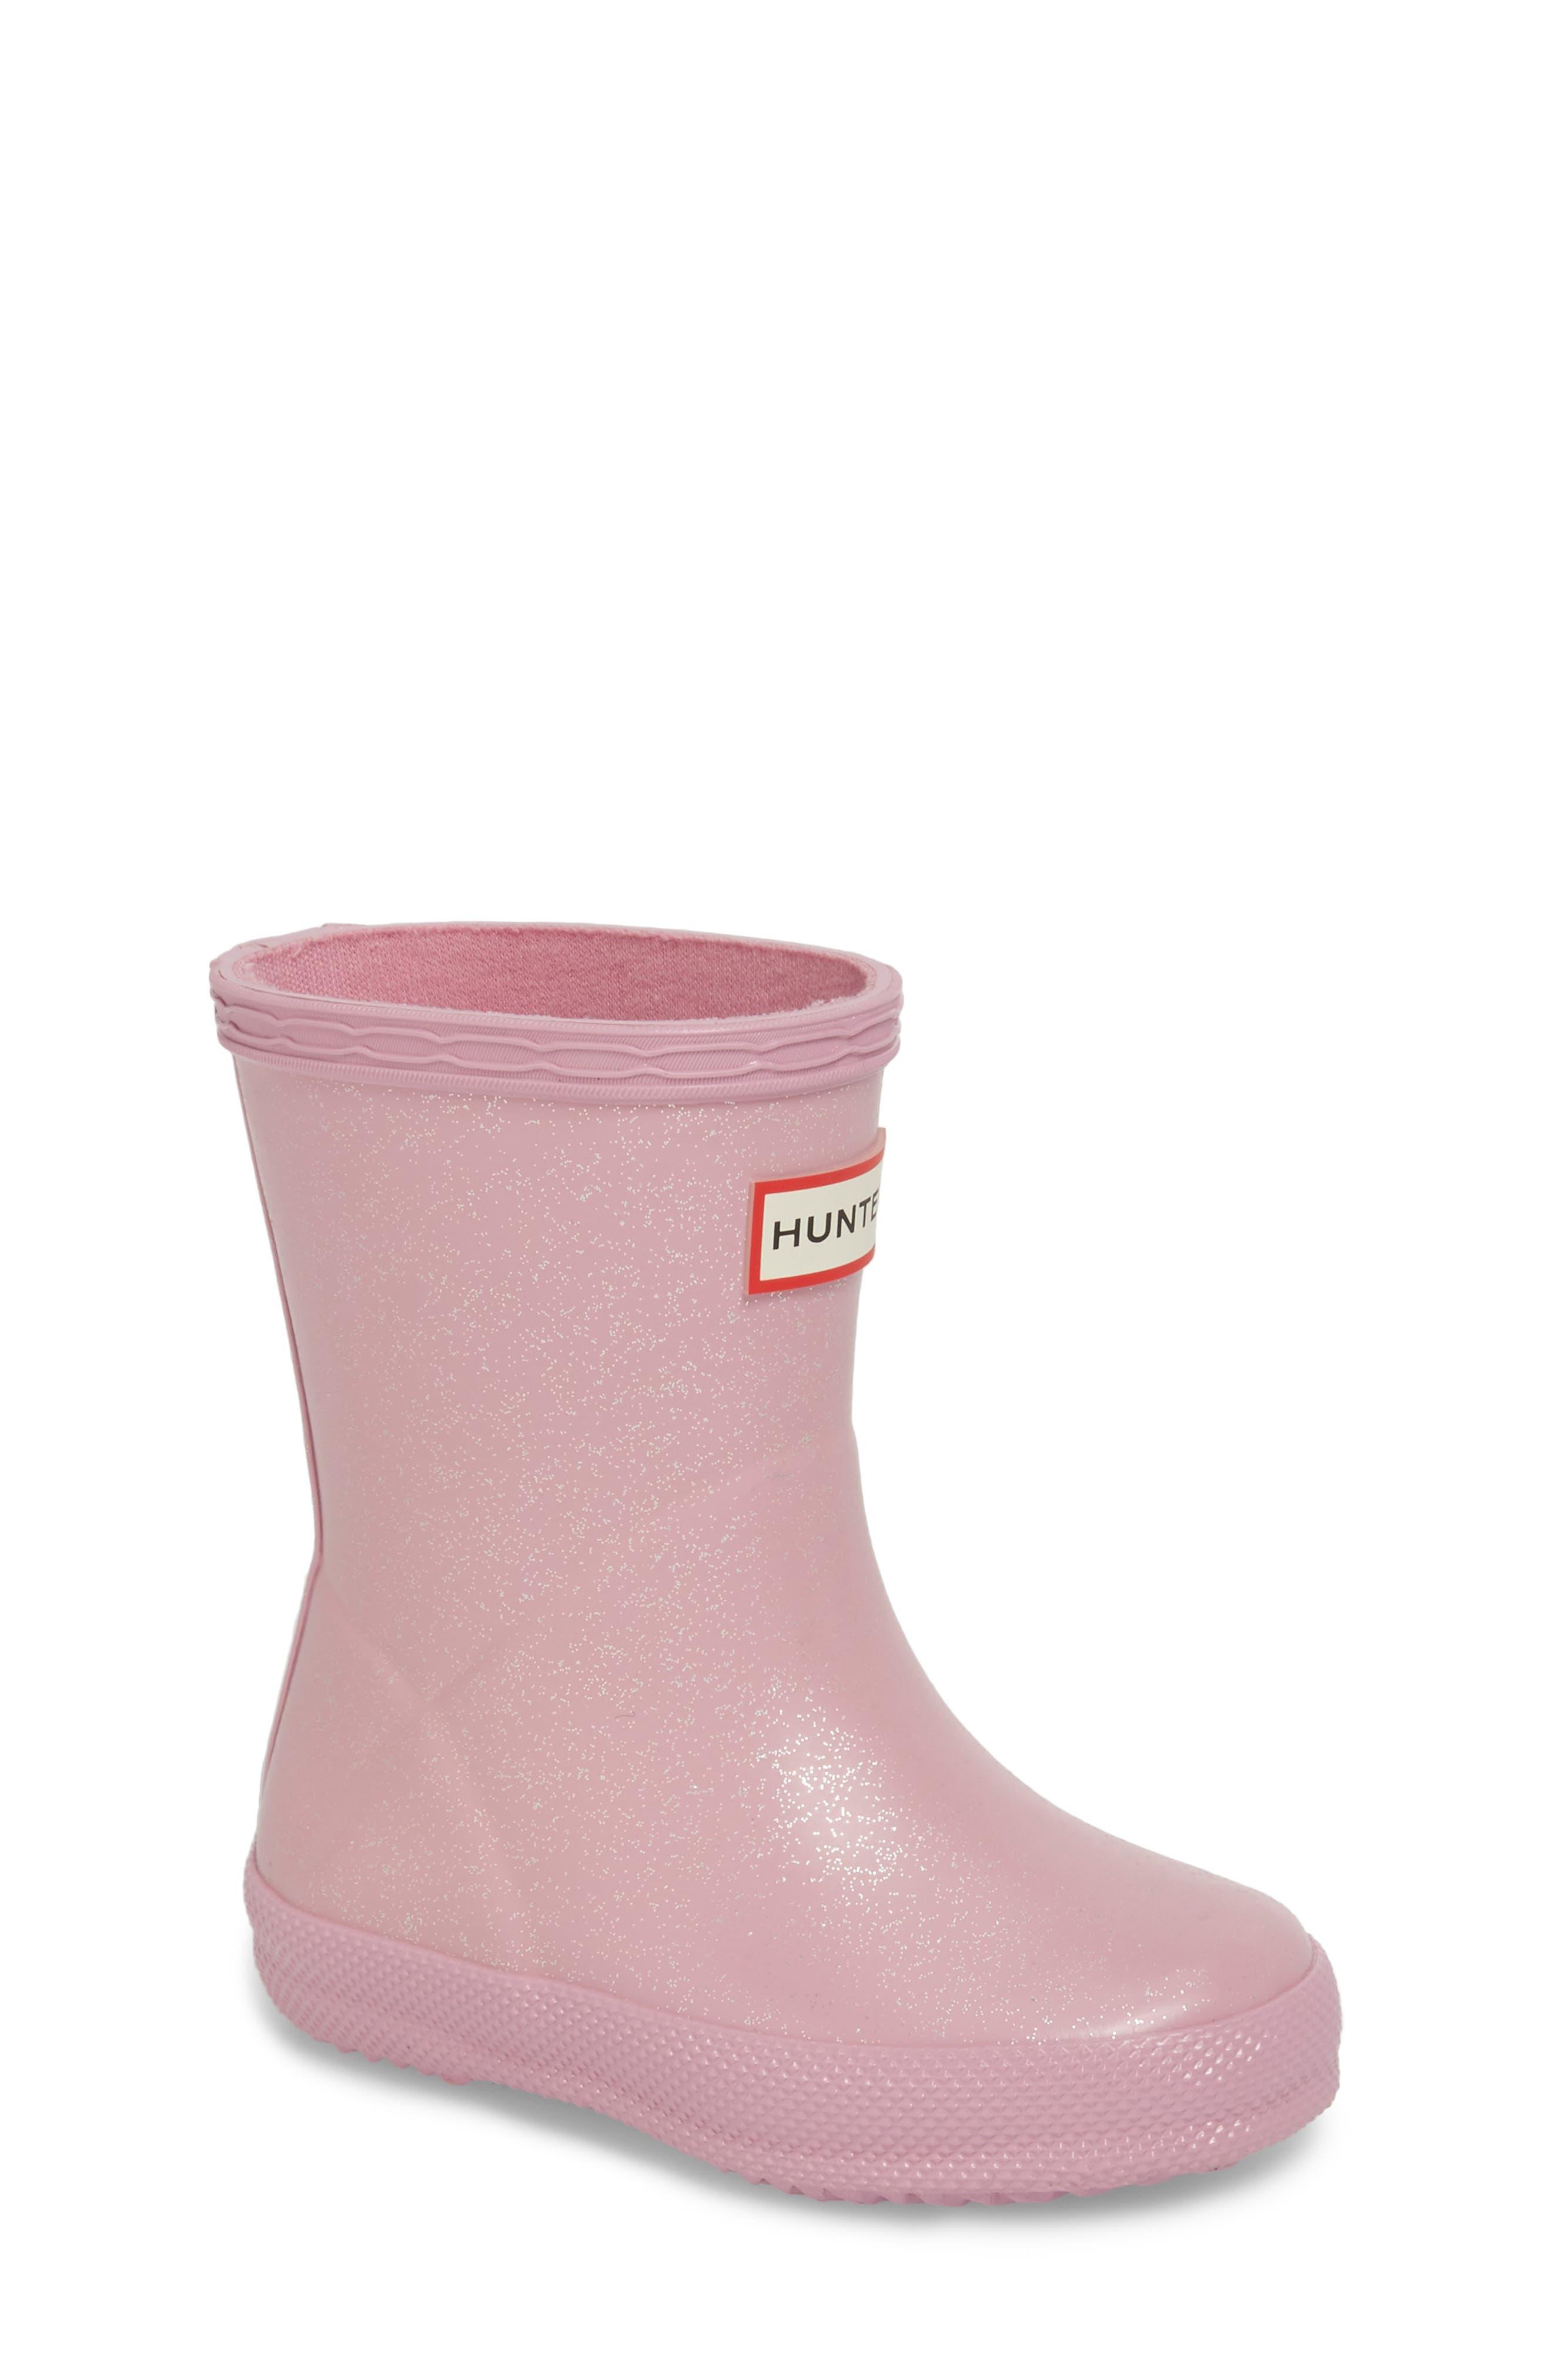 'First Classic' Glitter Rain Boot,                             Main thumbnail 1, color,                             Blossom